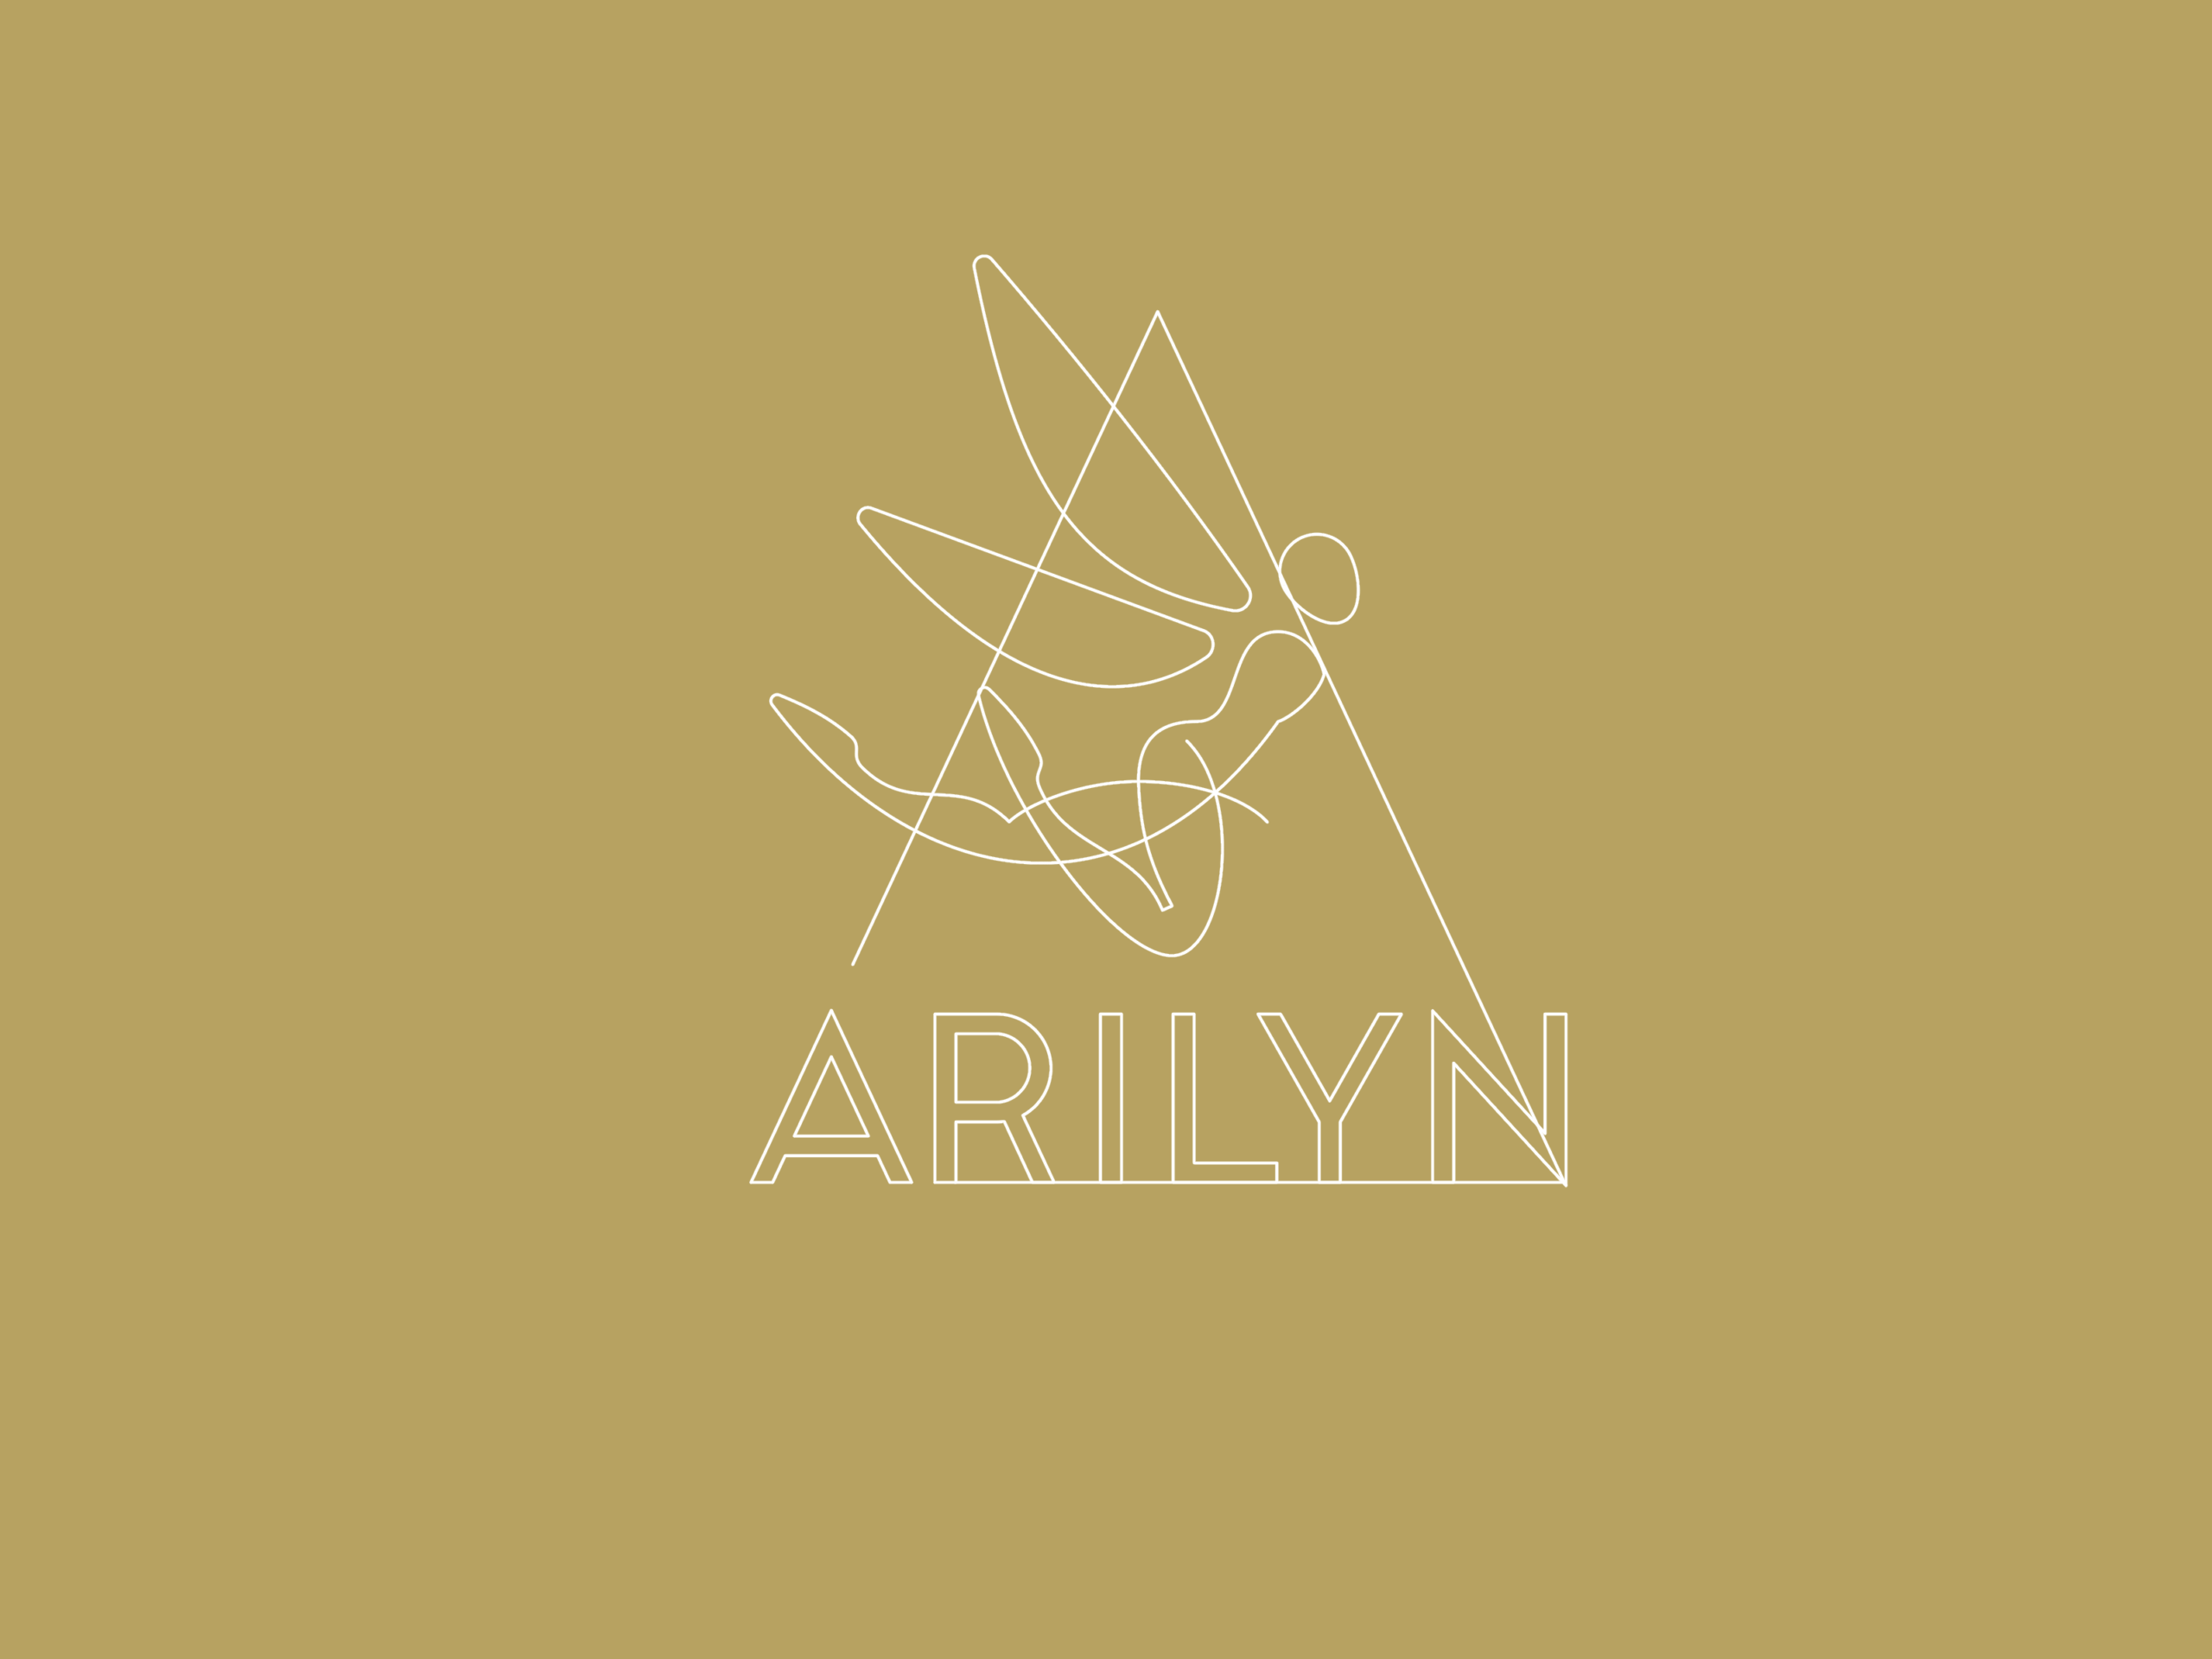 arilyn-tunnus2-goldprint-2019-11-22